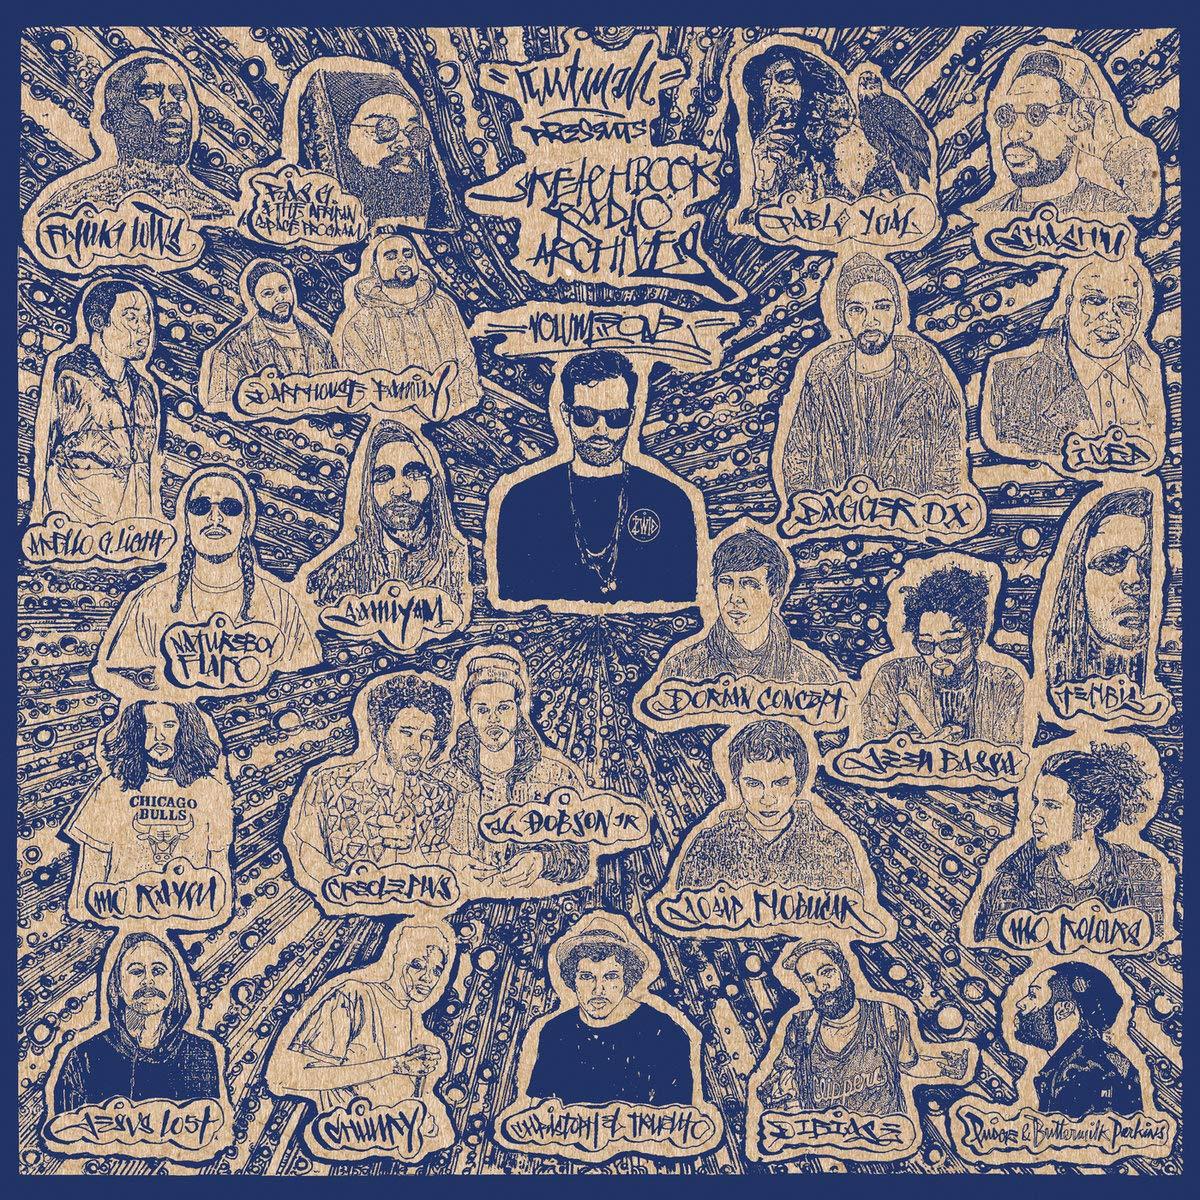 Vinilo : Kutmah Presents - Sketchbook Radio Archives Vol. 1 (LP Vinyl)